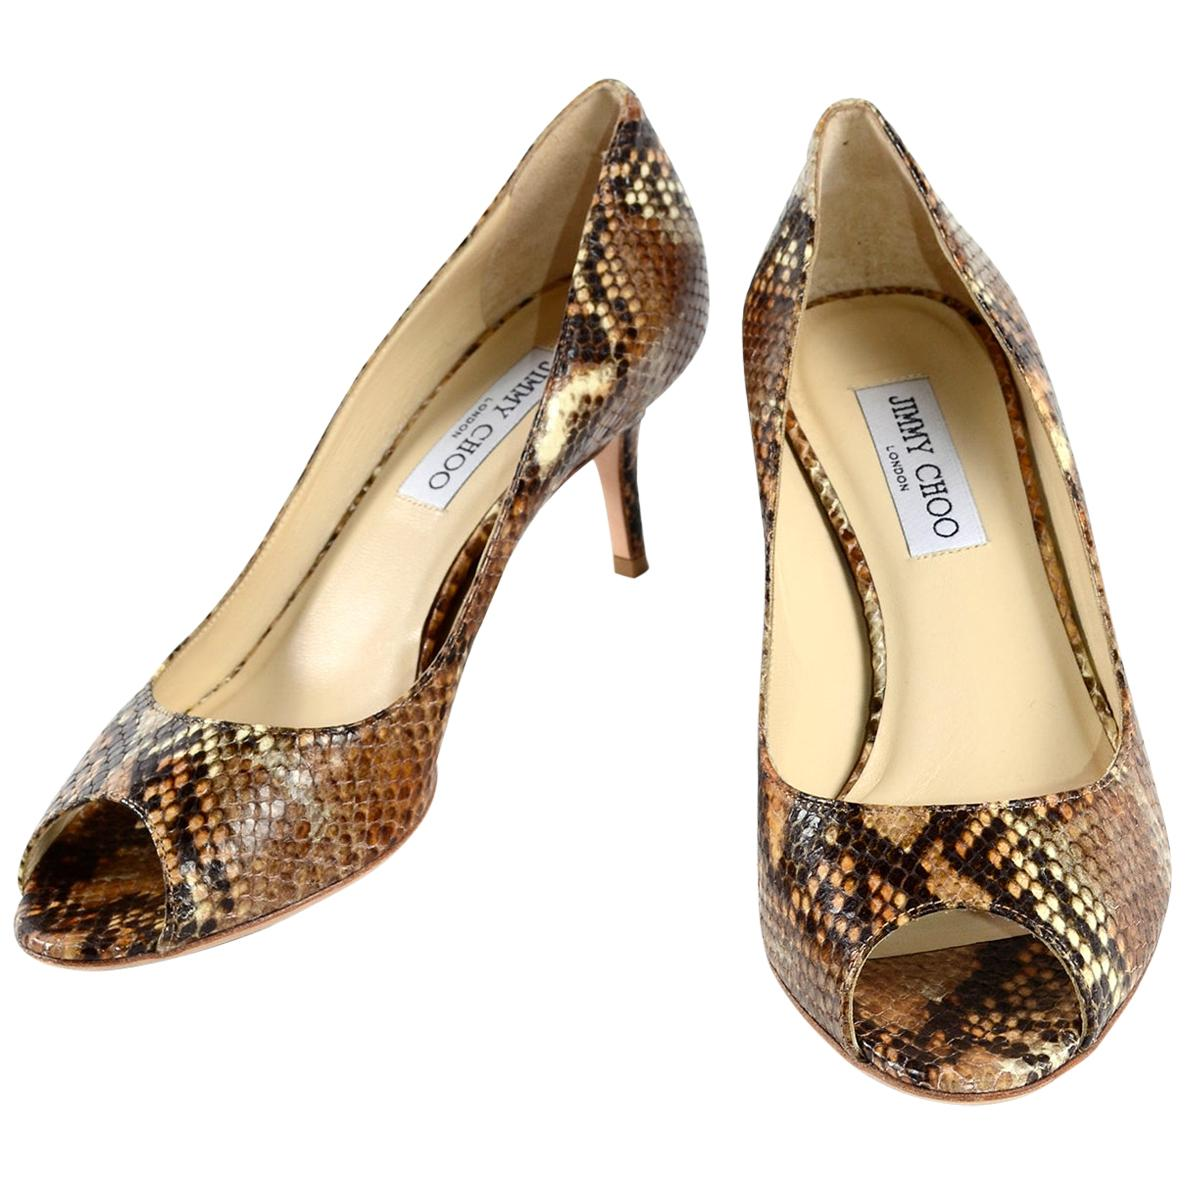 Jimmy Choo Isabel Python Snakeskin Peep Toe Kitten Heel Shoes Size 38.5